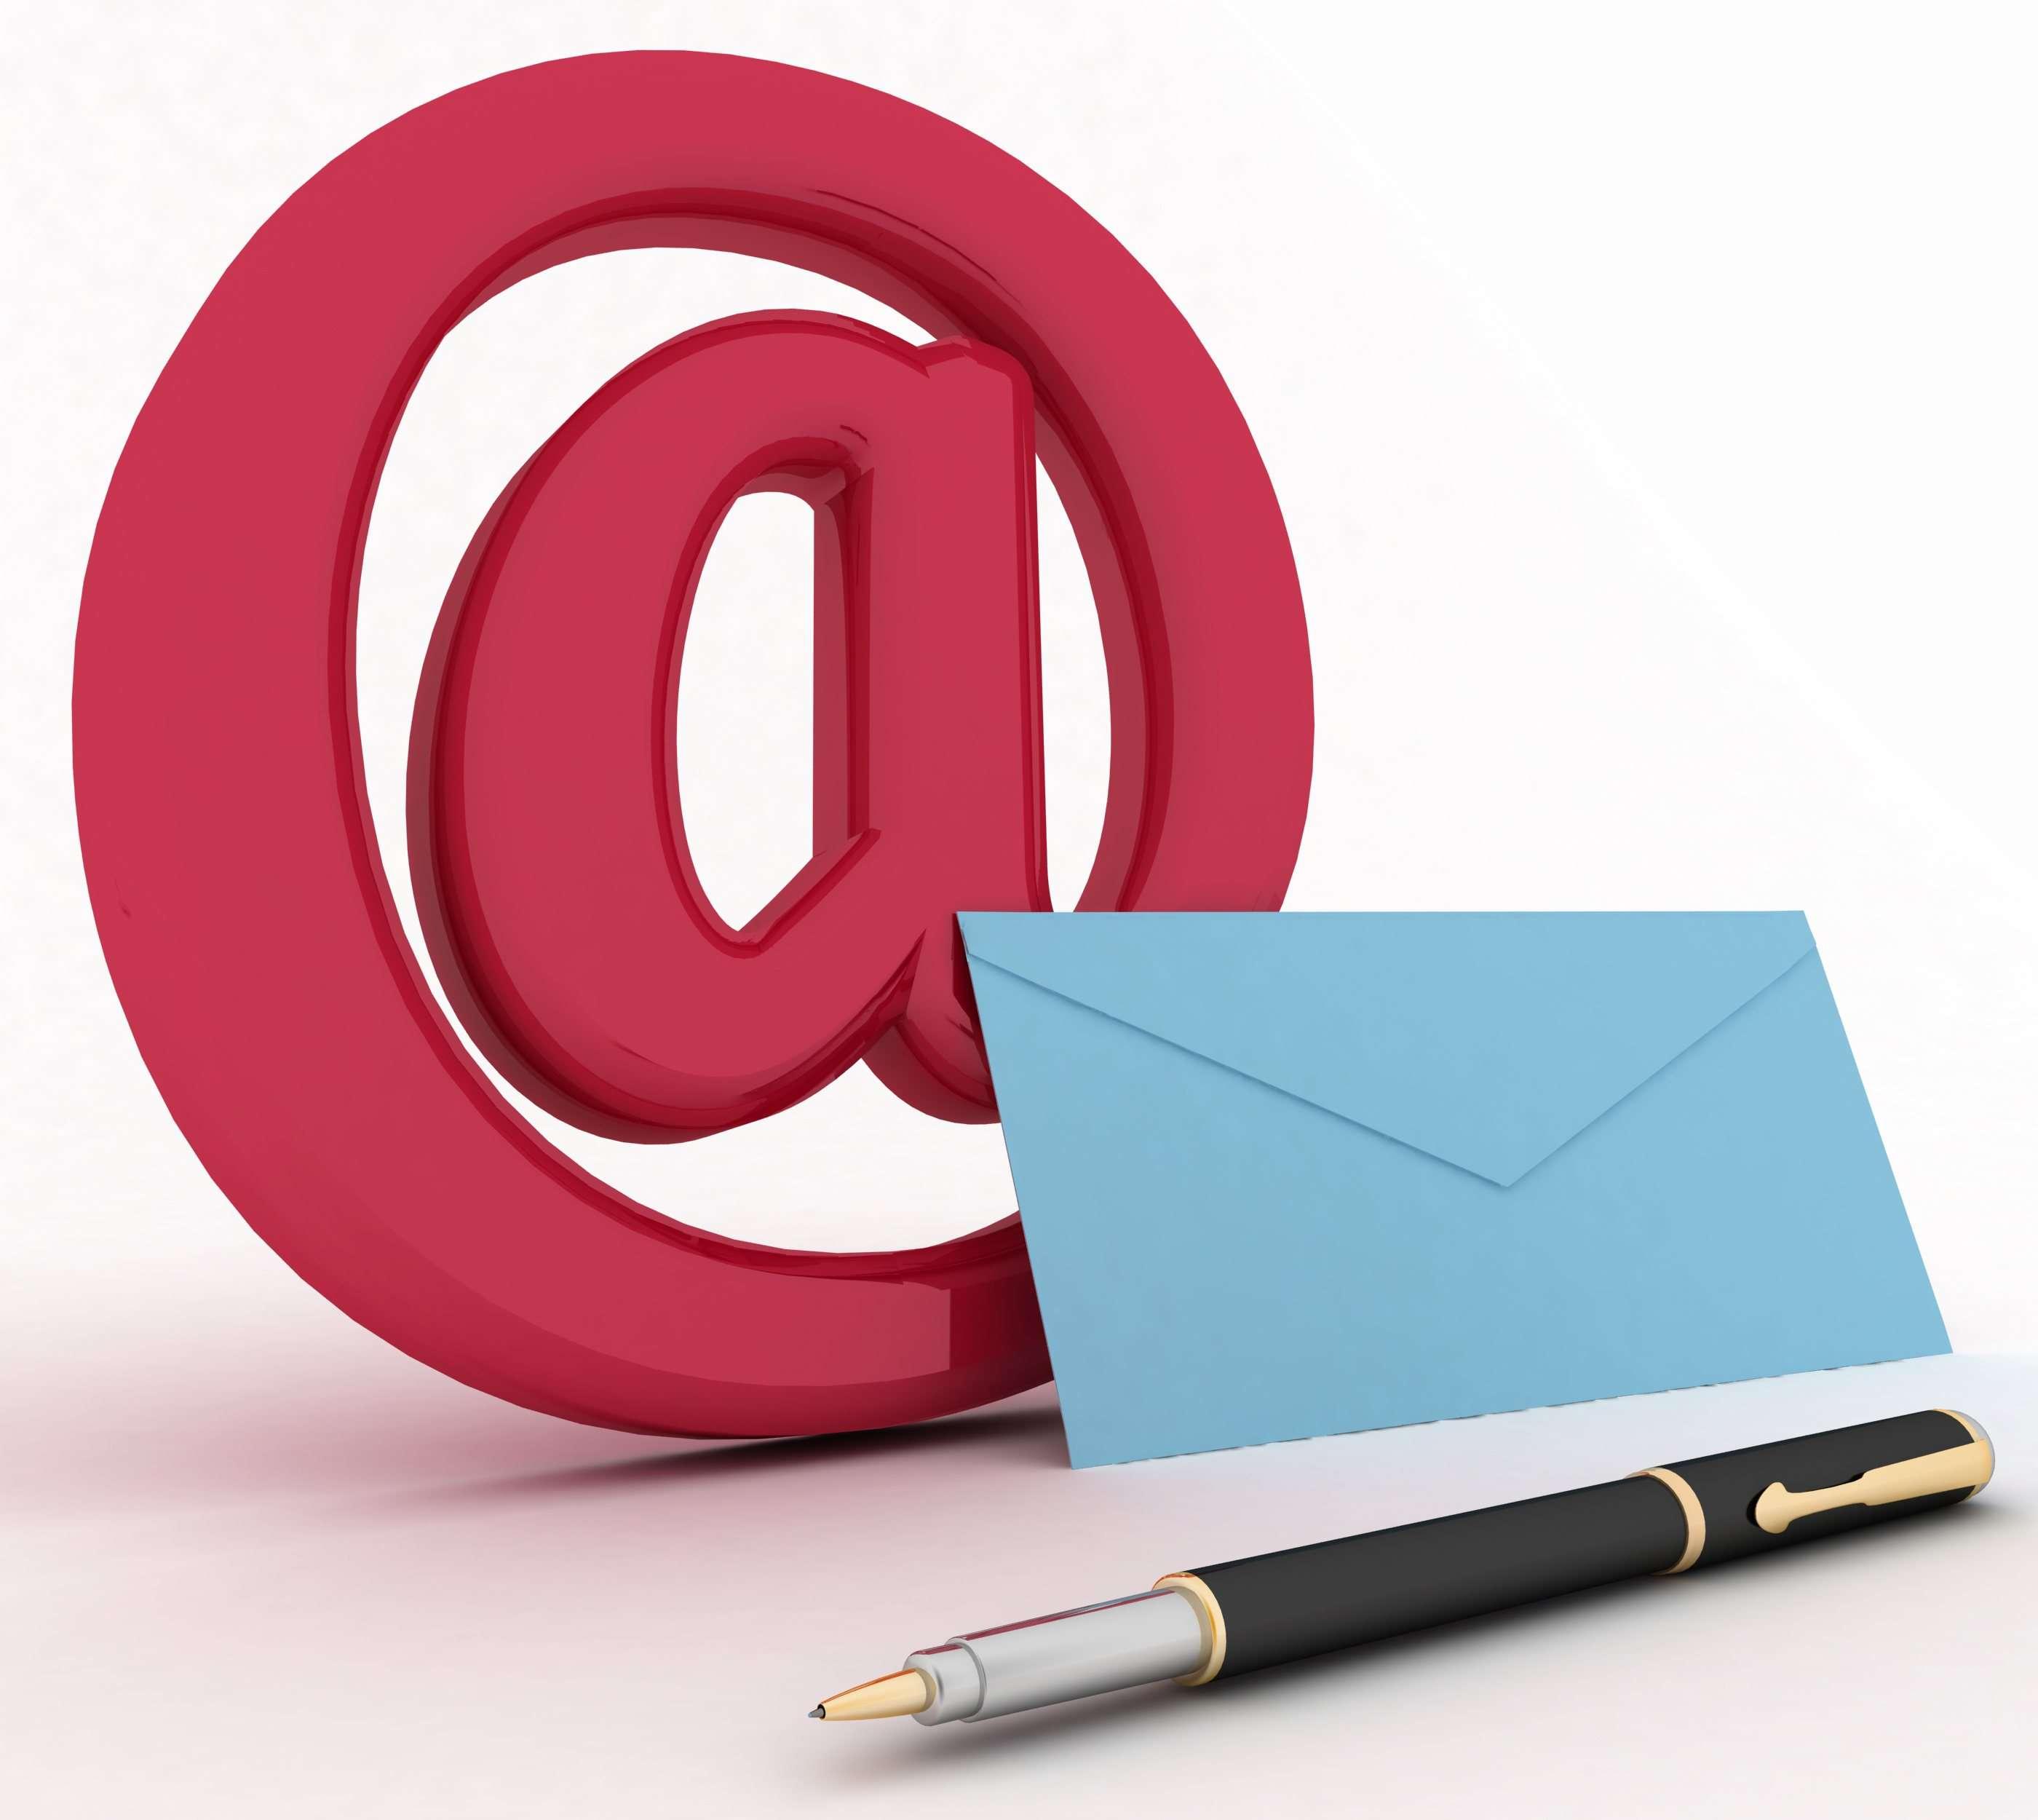 anrede, brief, mail, anrede mail, anrede brief